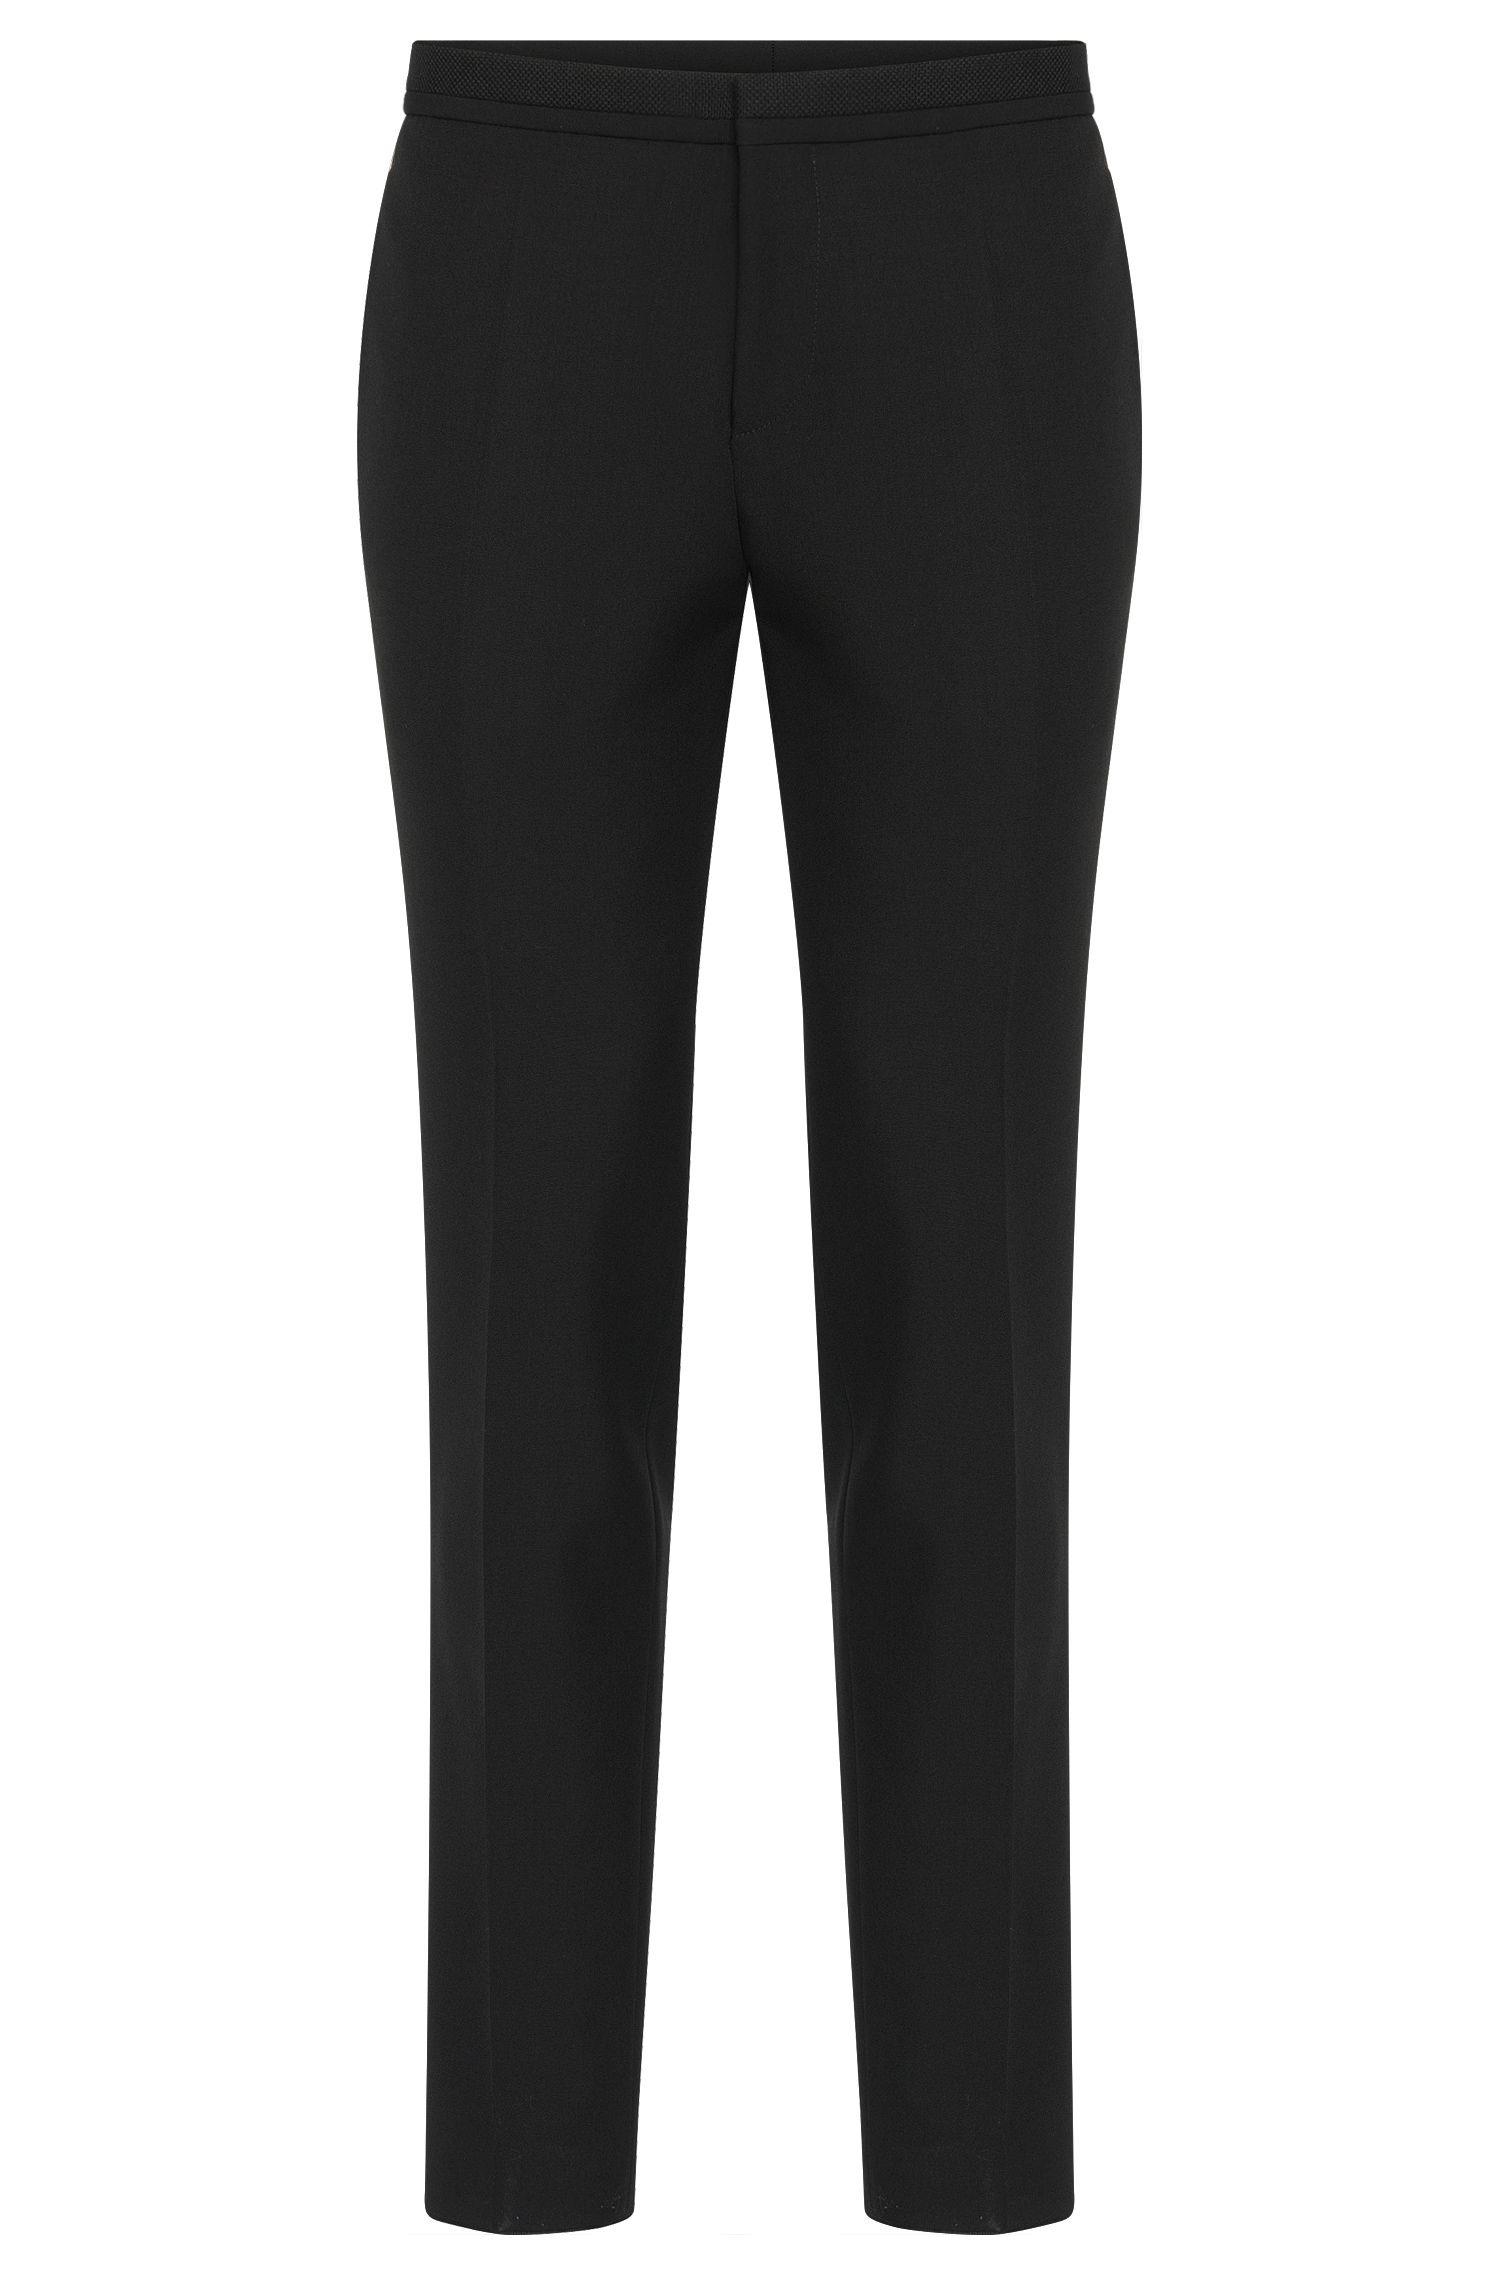 Pantalon Extra Slim Fit à plis marqués: «Wynn1_1»